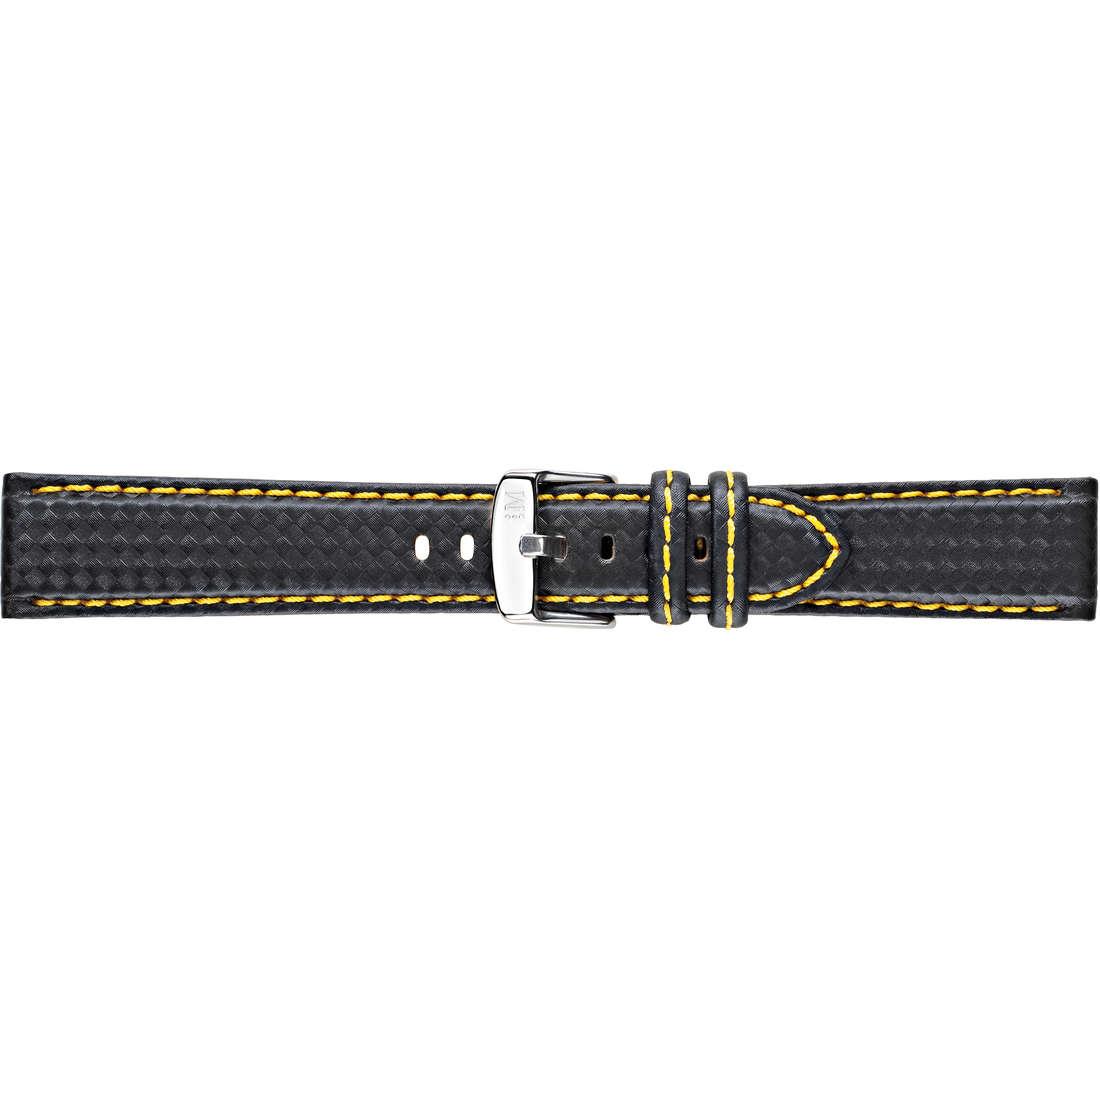 montre bande de montres homme Morellato Linea Sport A01U3586977897CR18